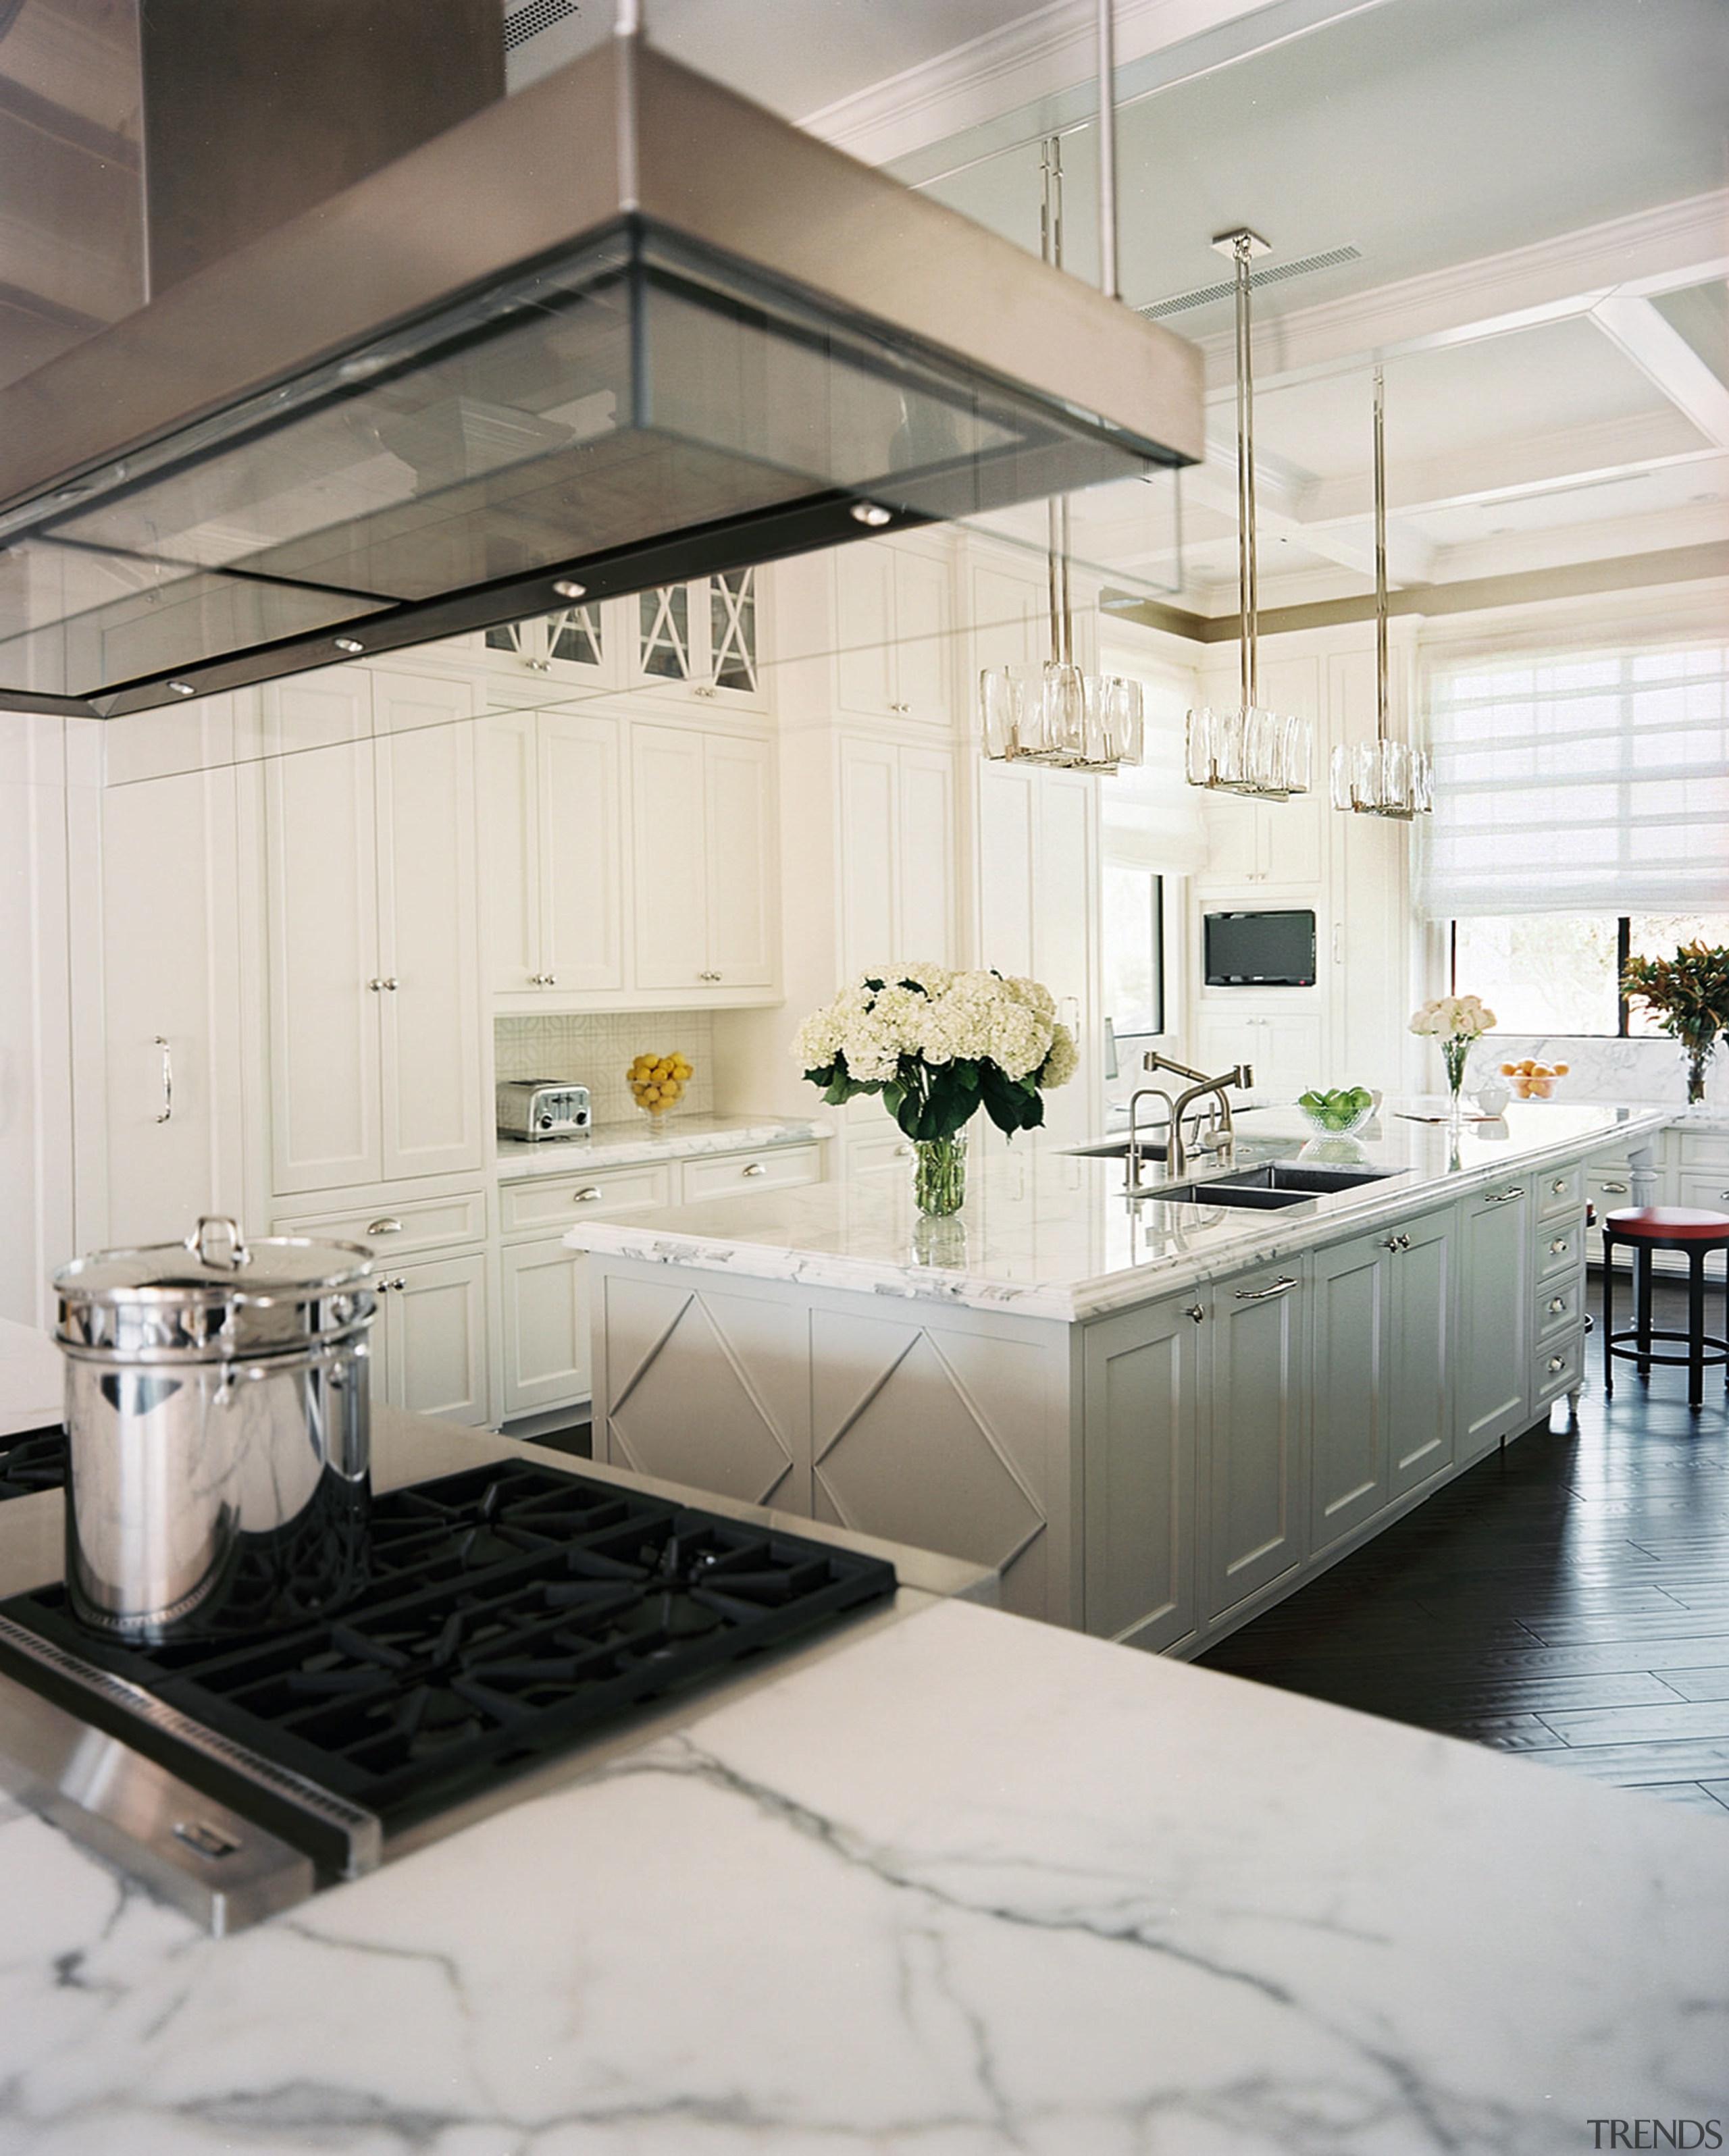 Sparkling pendant lights reinforce the sense that the countertop, cuisine classique, floor, flooring, interior design, kitchen, room, white, gray